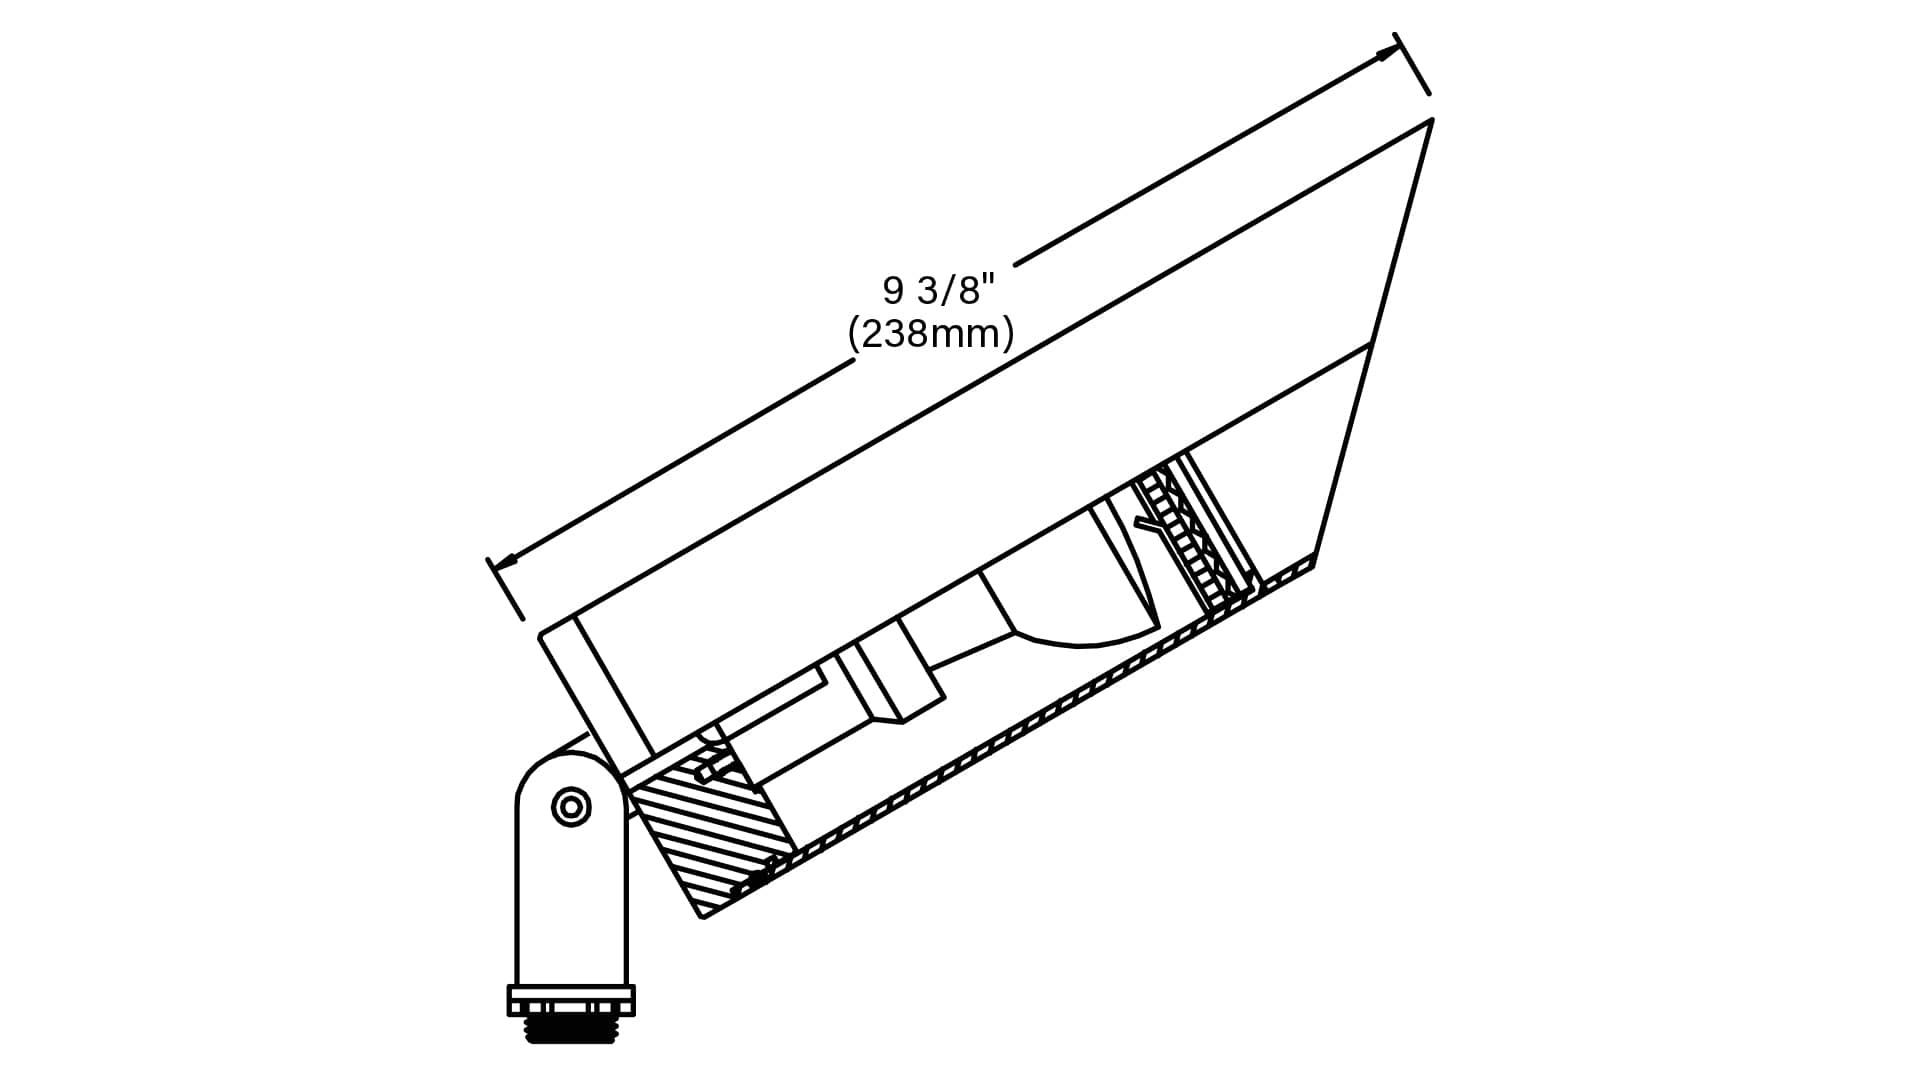 02-cad-331 image